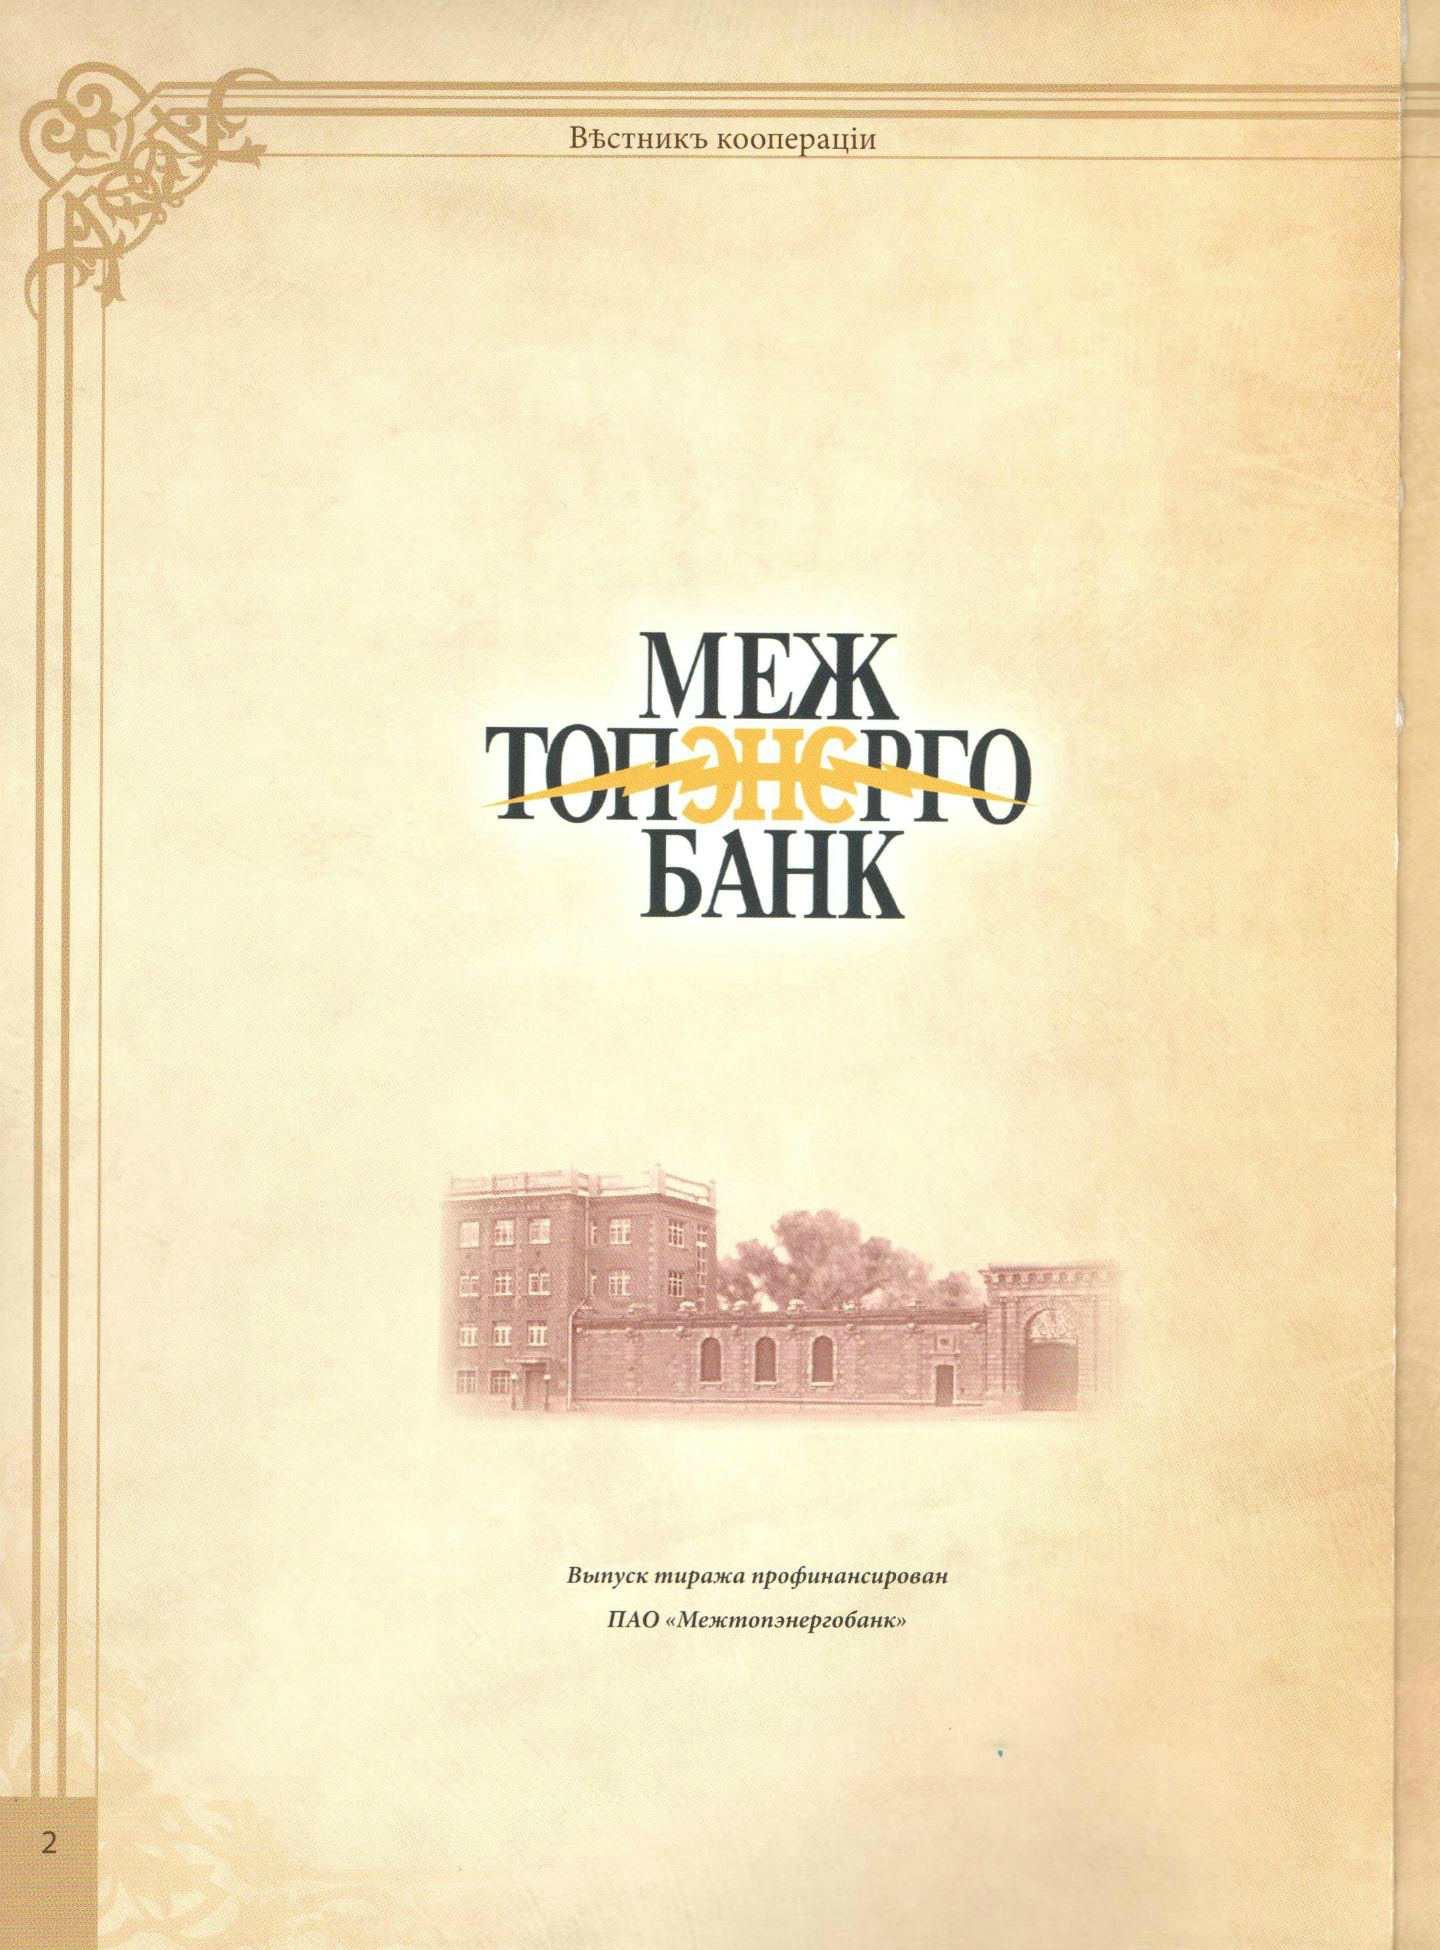 Вестник кооперации-2